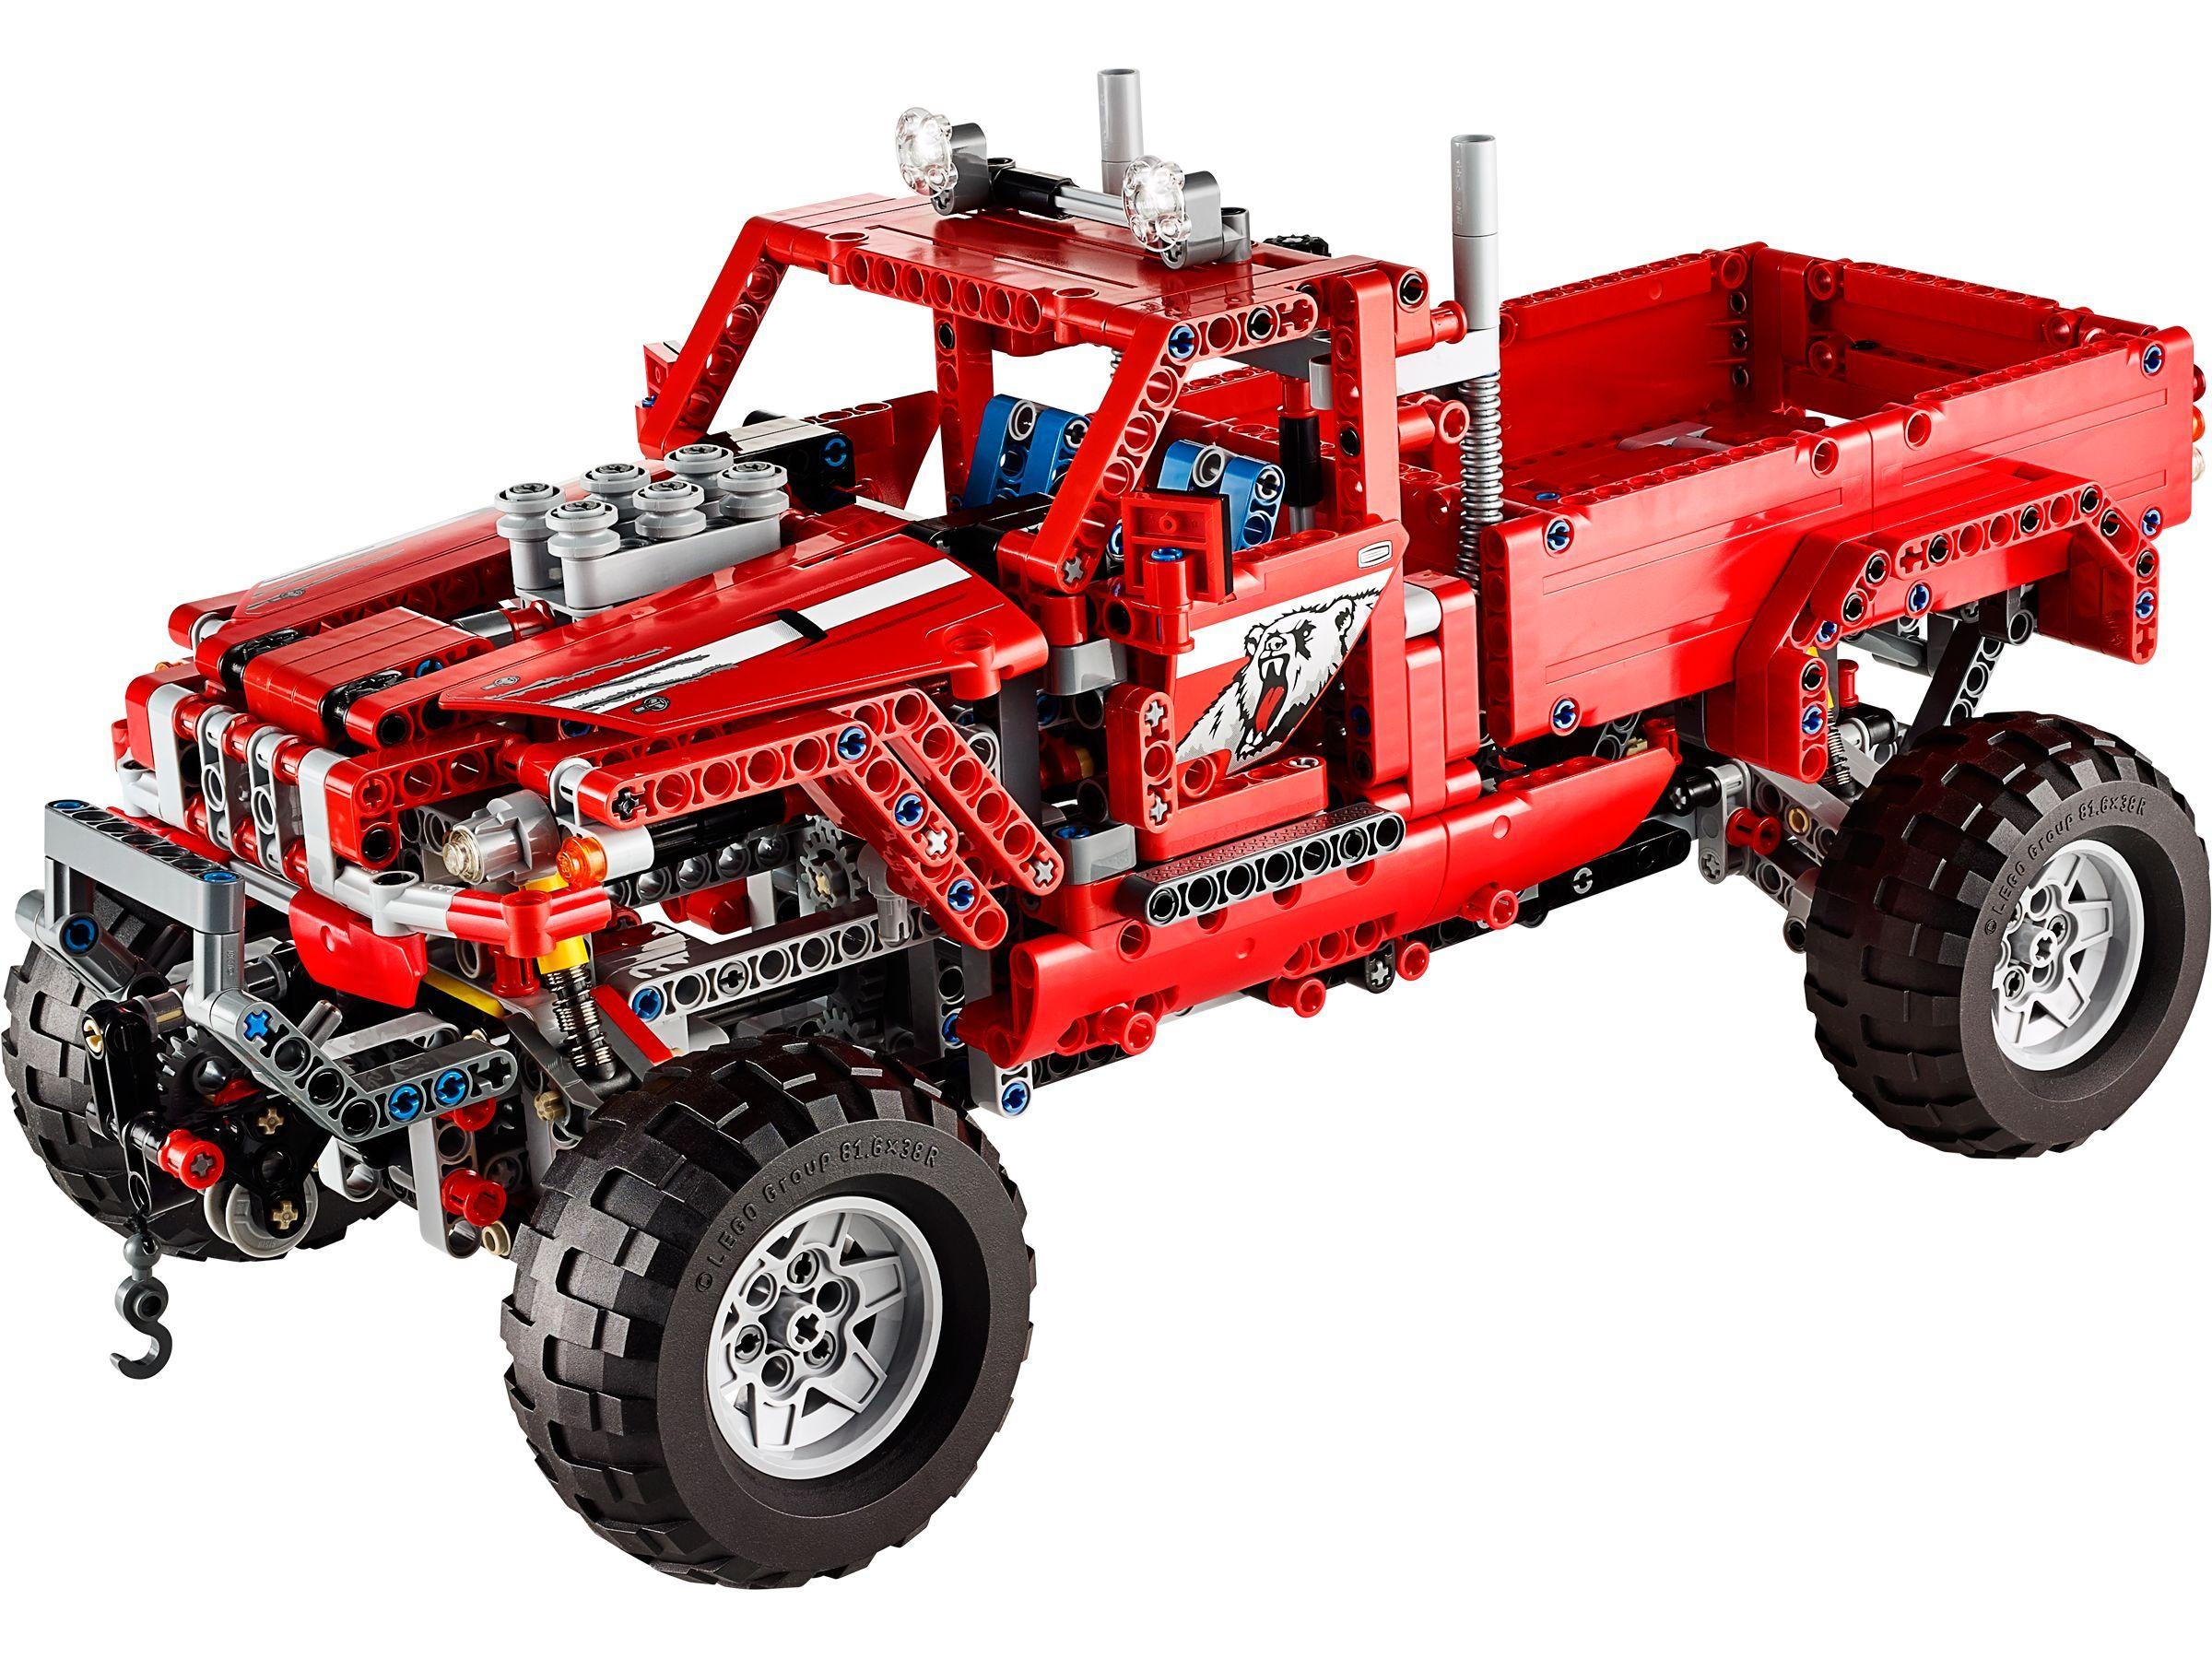 Technicbricks July 2014 Lego Technic Lego Technic Sets Truck Living